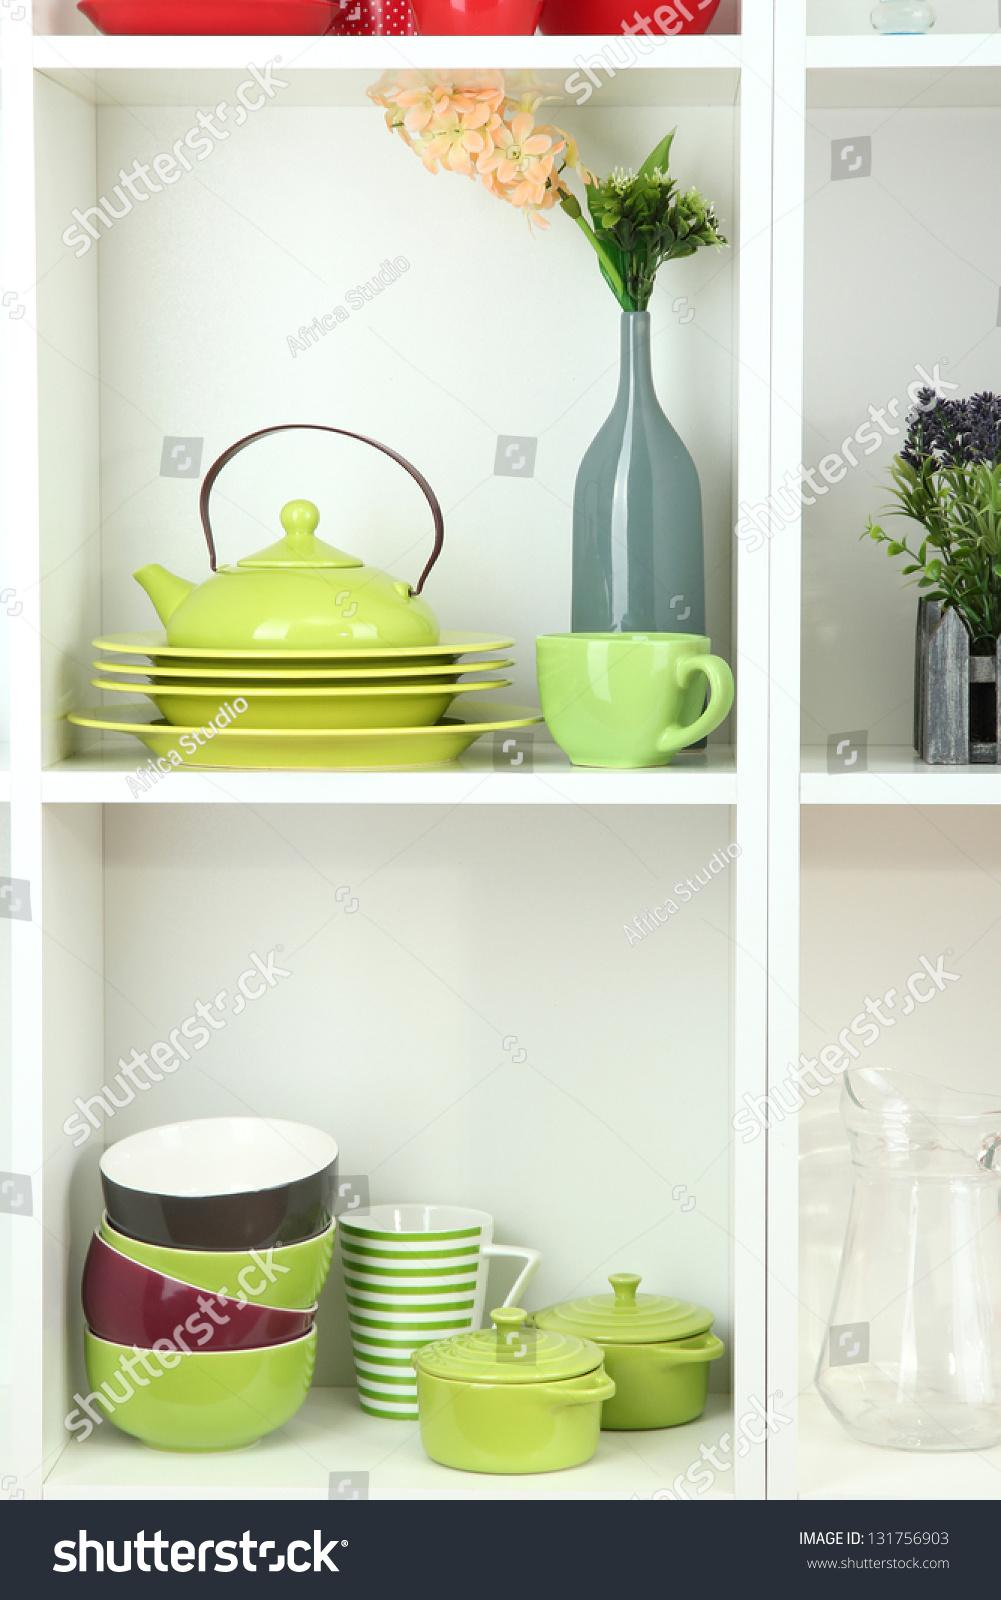 Beautiful white shelves with tableware and decor stock photo 131756903 shutterstock - Beautiful photoshelves ...